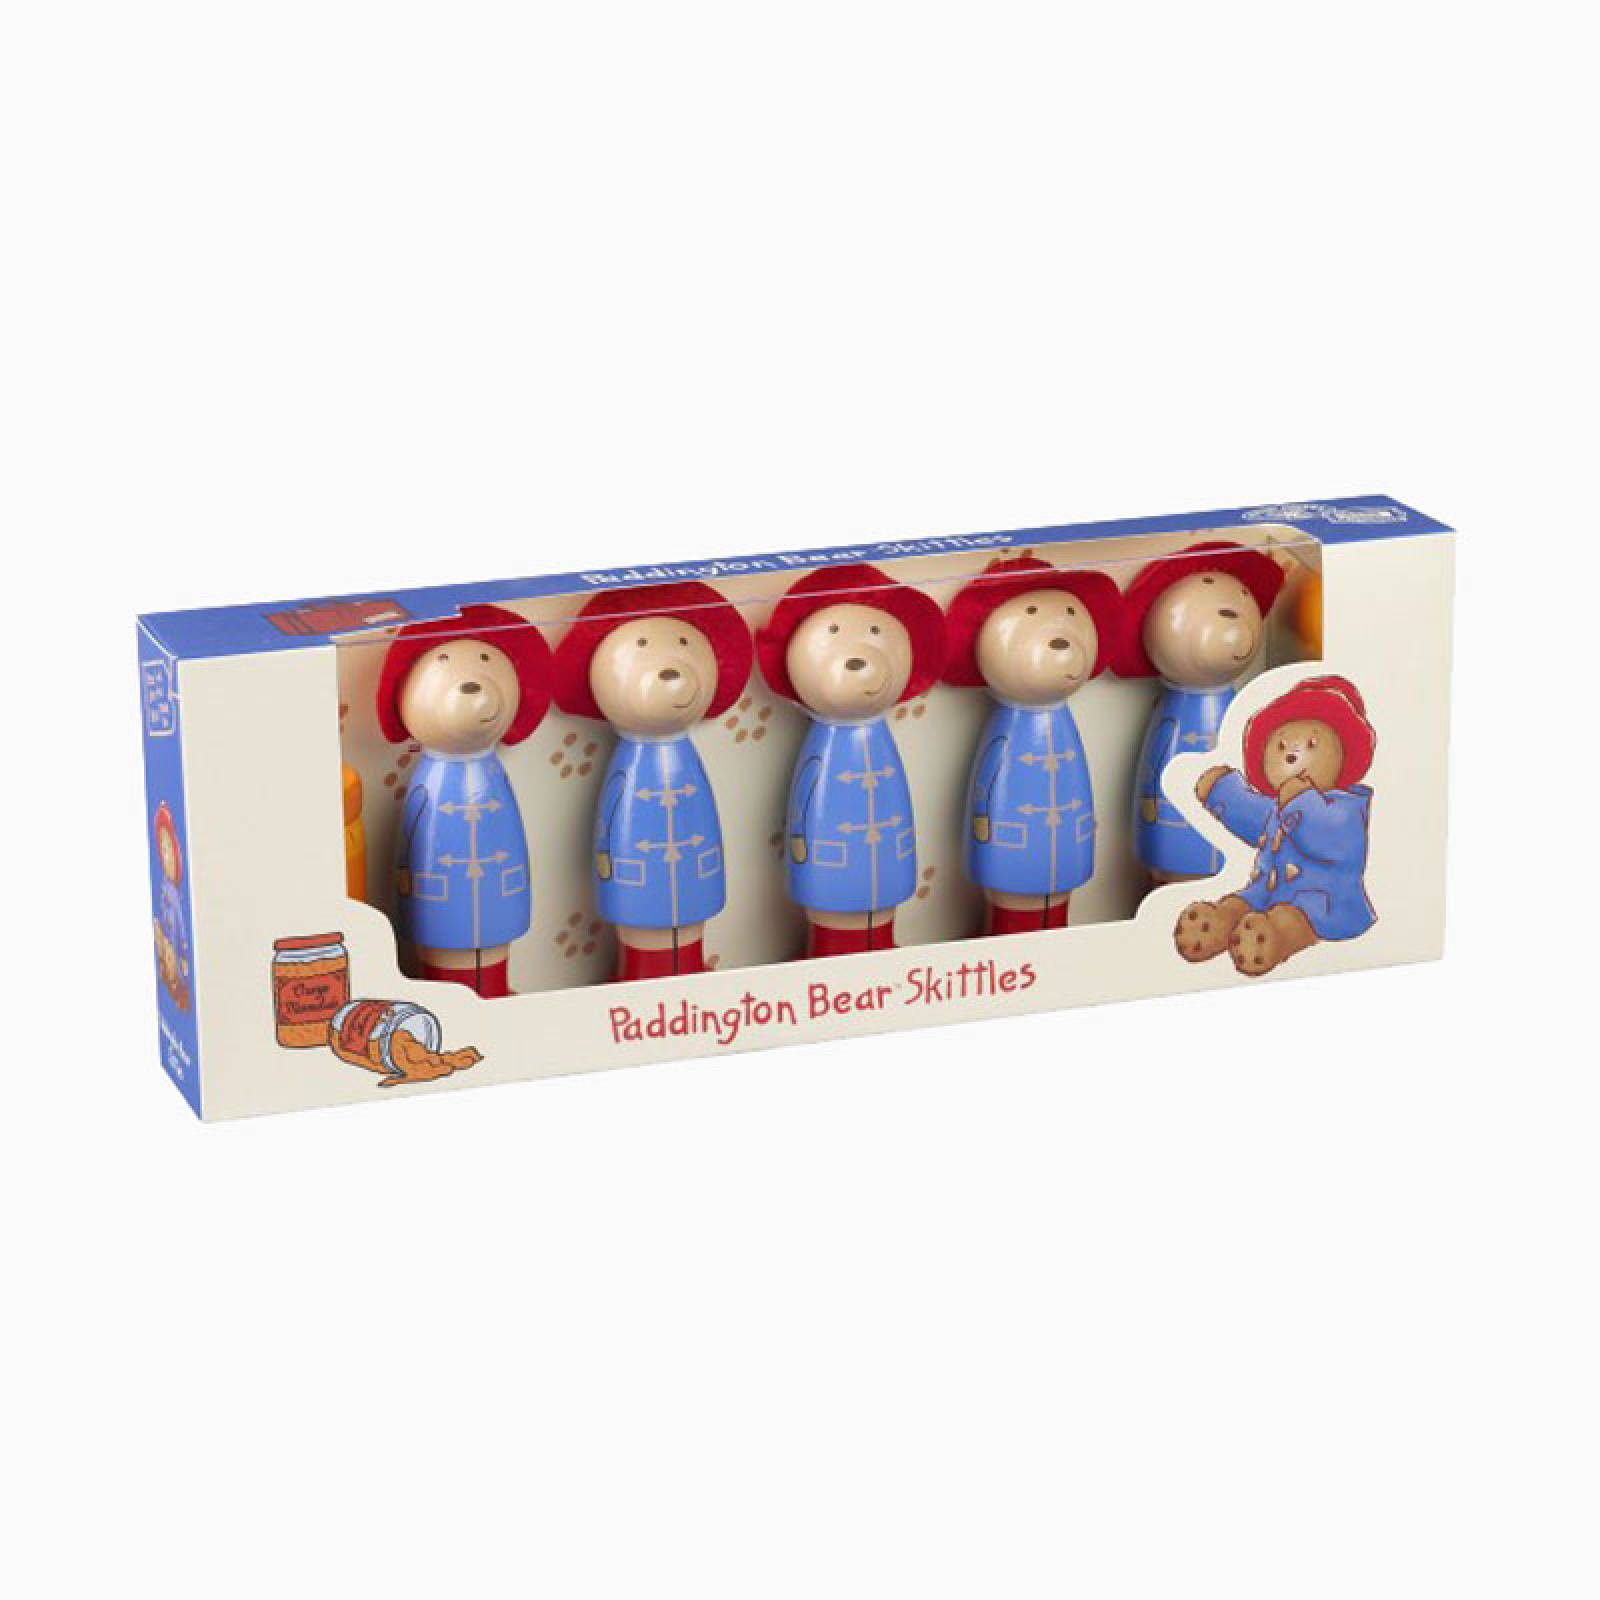 Paddington Bear Skittles By Orange Tree Toys 1+ thumbnails